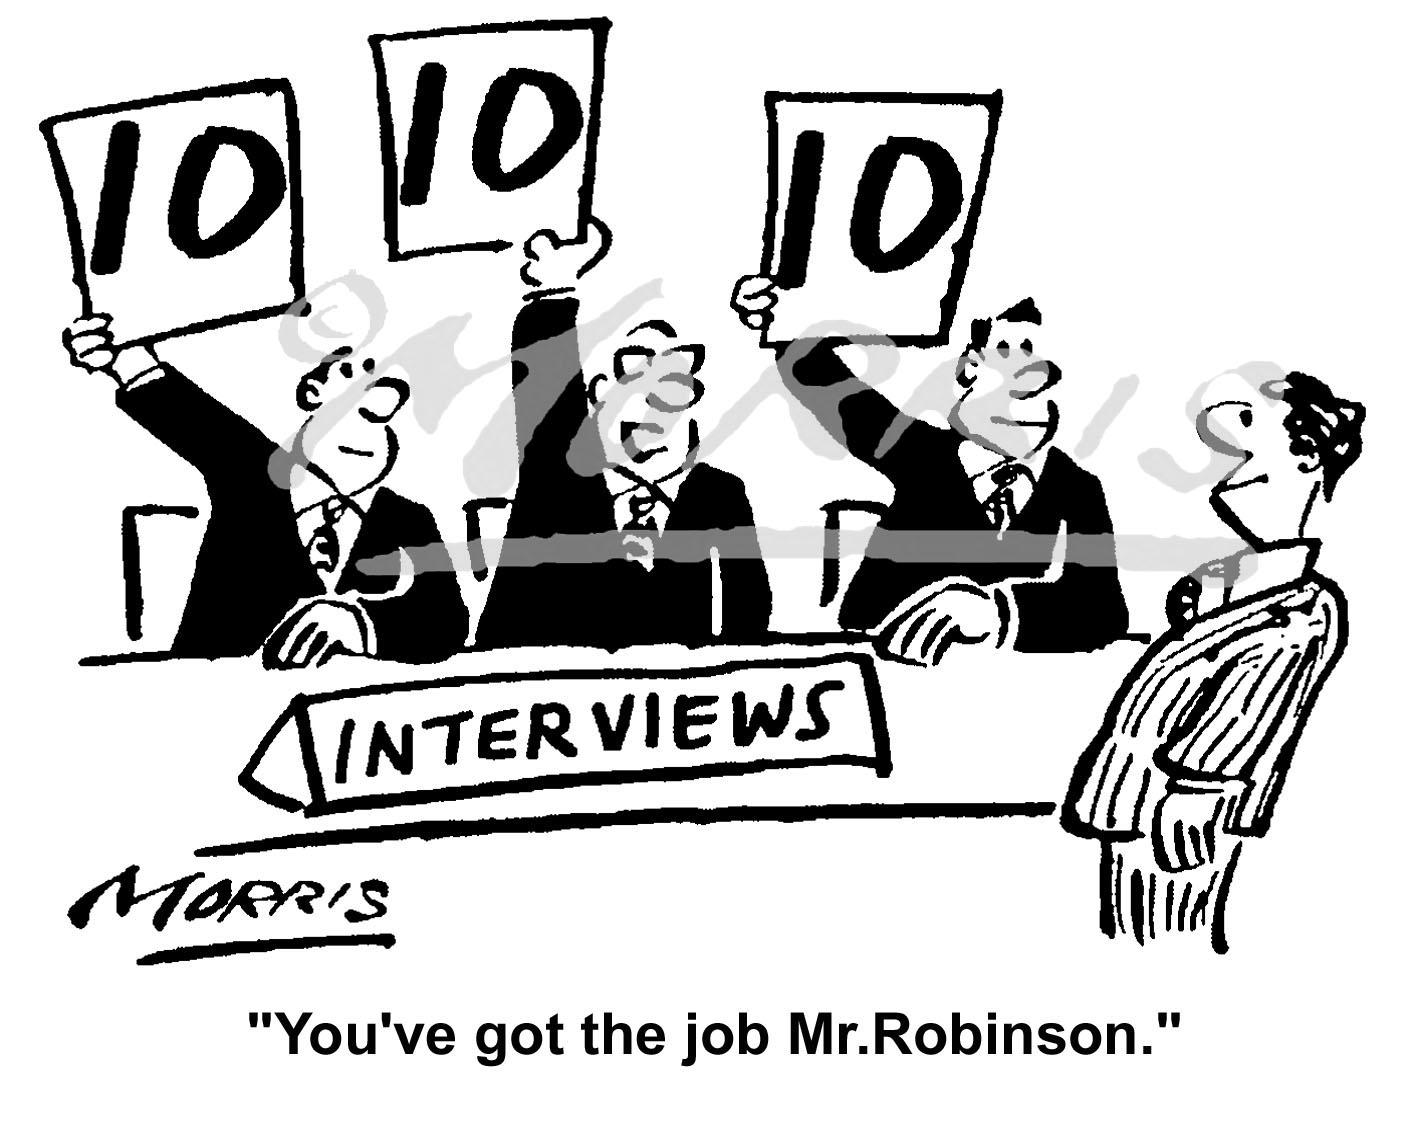 Recruitment, Hiring and Interview business cartoon – Ref: 6221bw